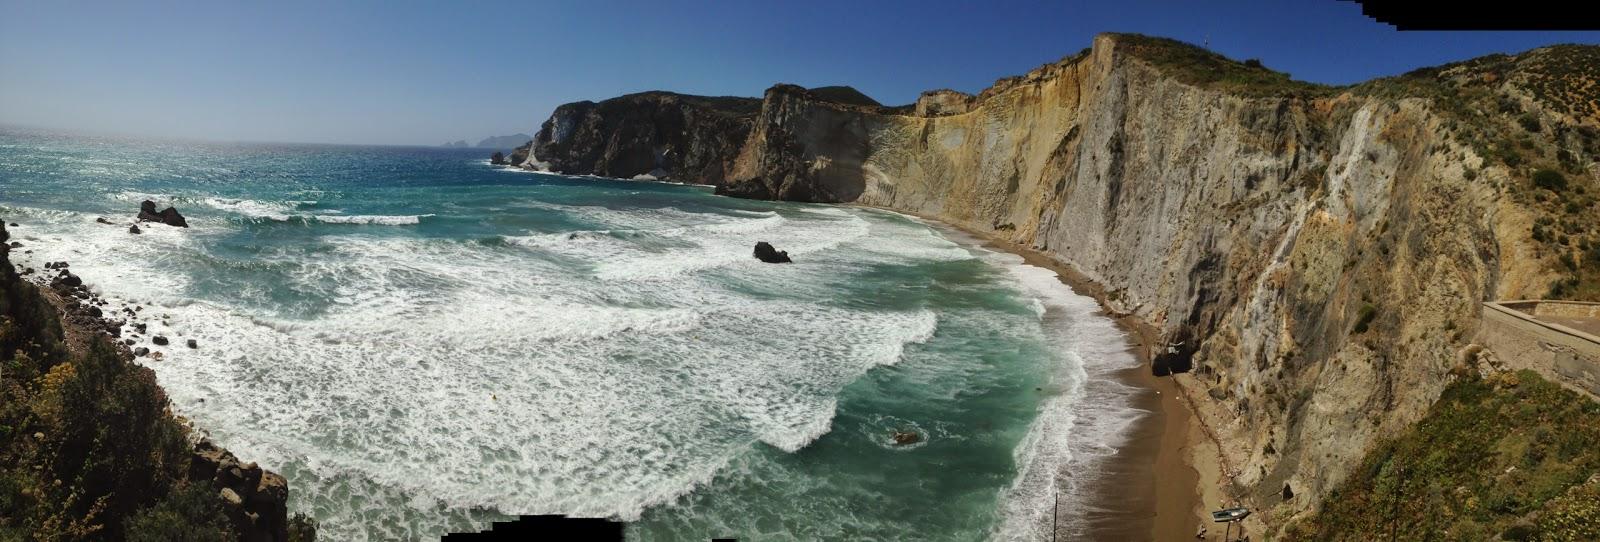 Beach Italy Ponza